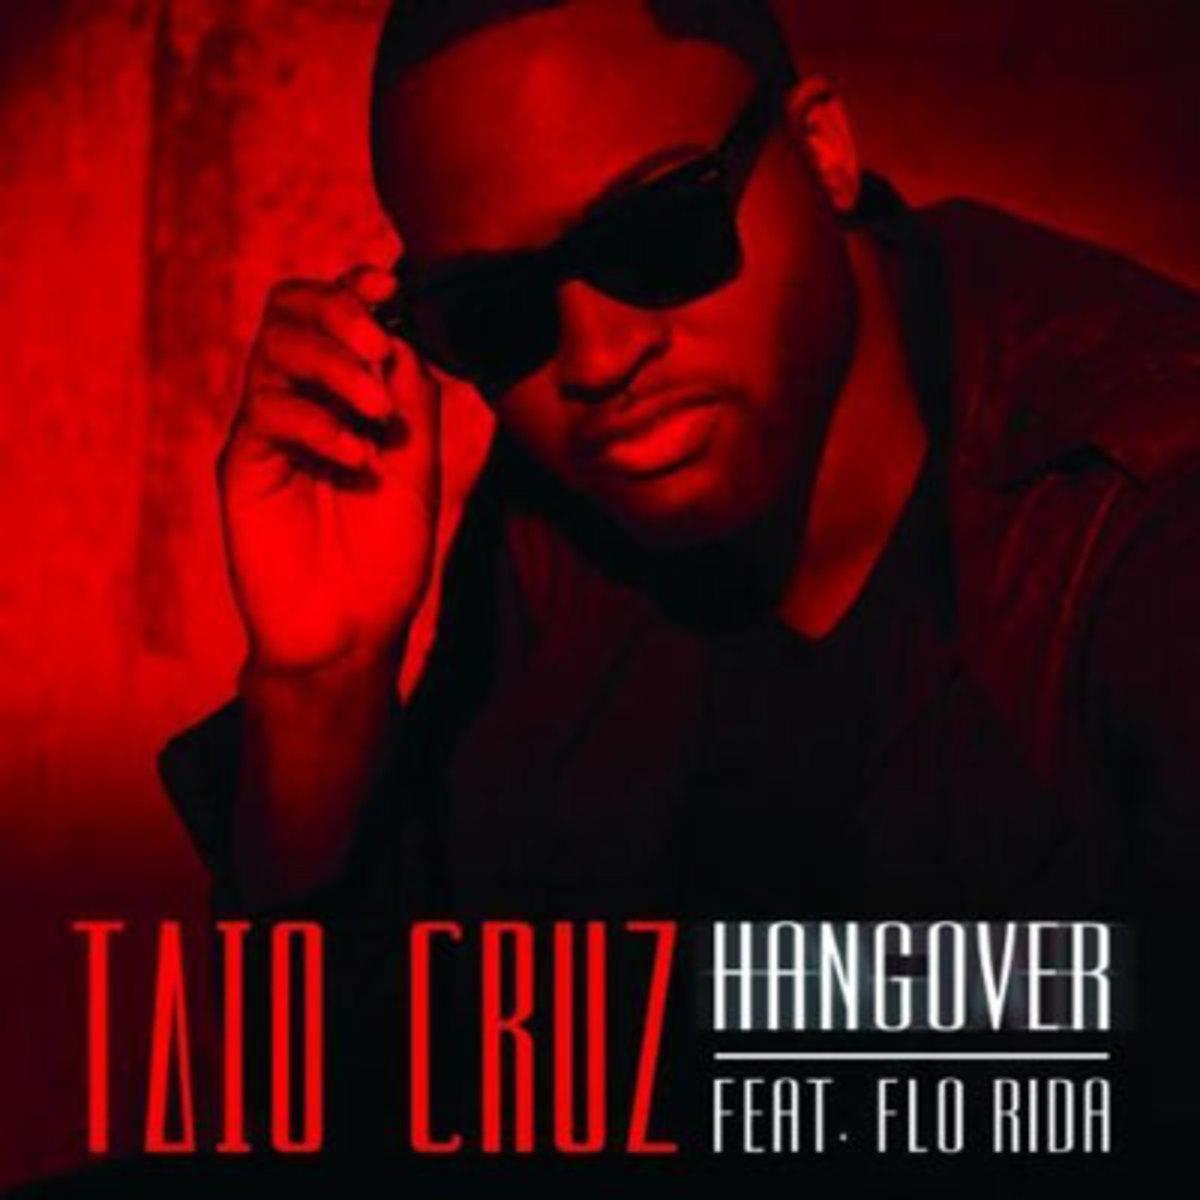 taiocruz-hangover2.jpg